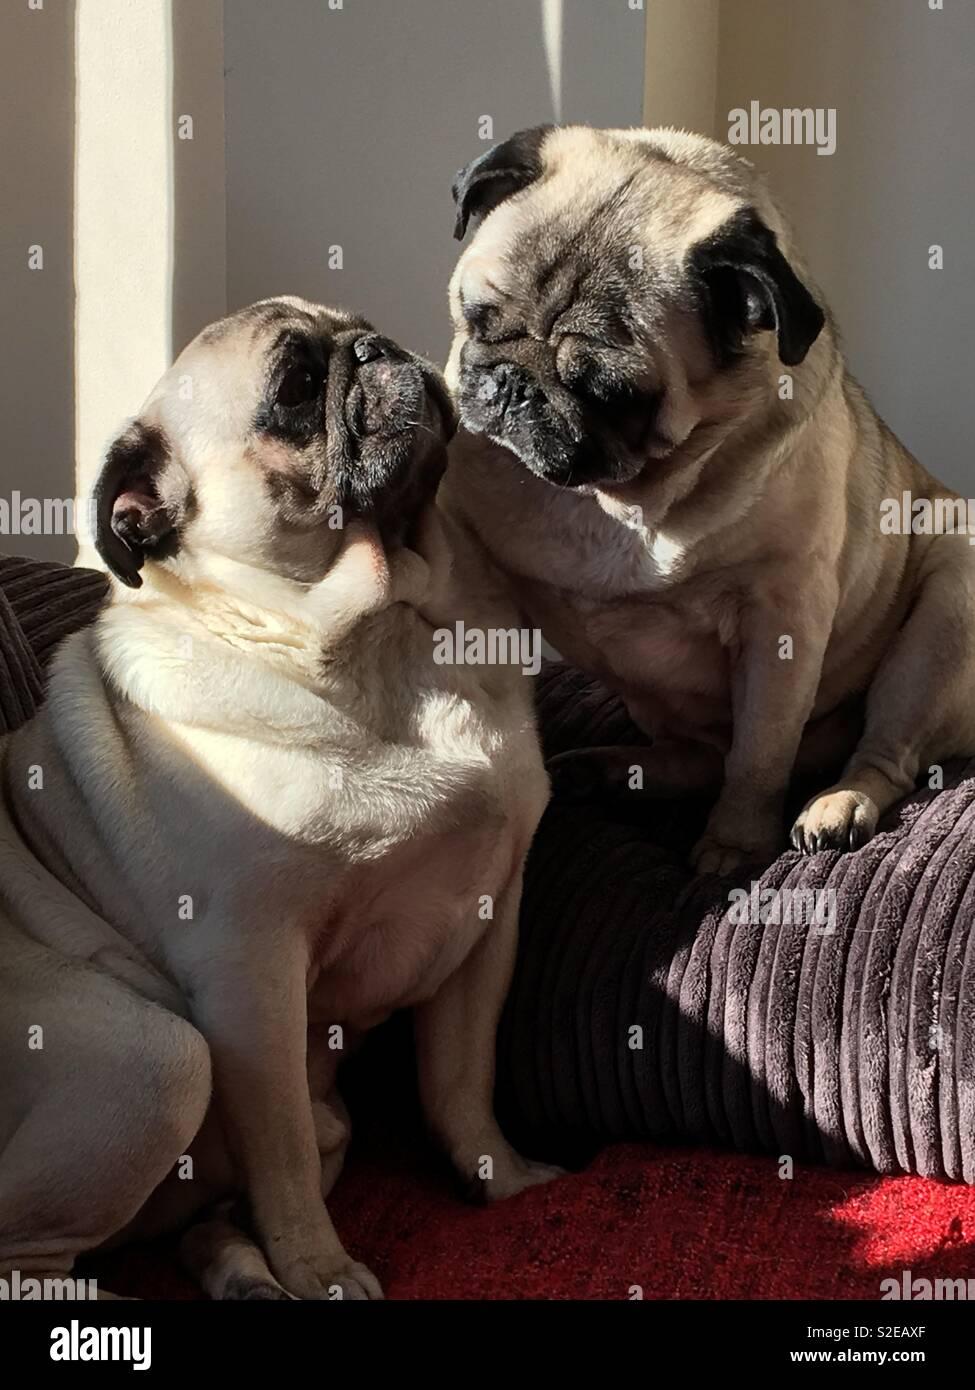 Brotherly pug love - Stock Image